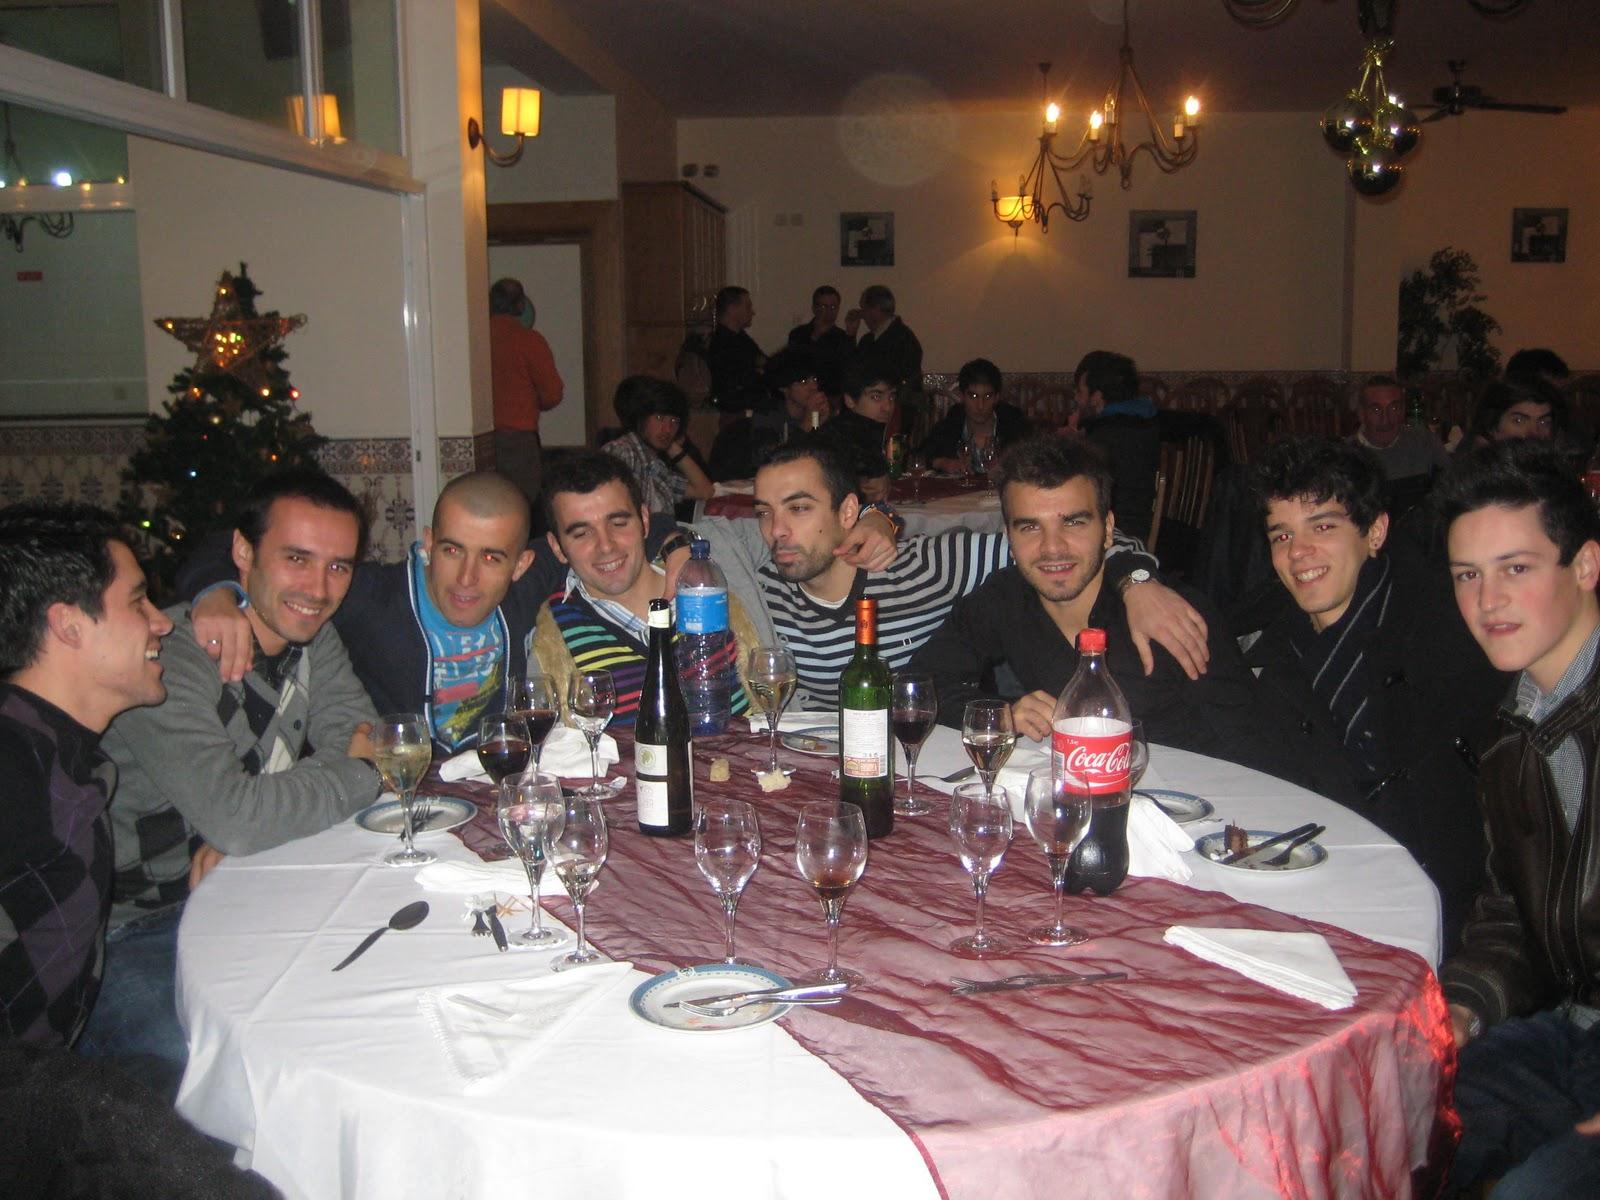 Futsal Júnior Masculino C.D.Aves: Jantar de Natal C.D.Aves Futsal #864D45 1600x1200